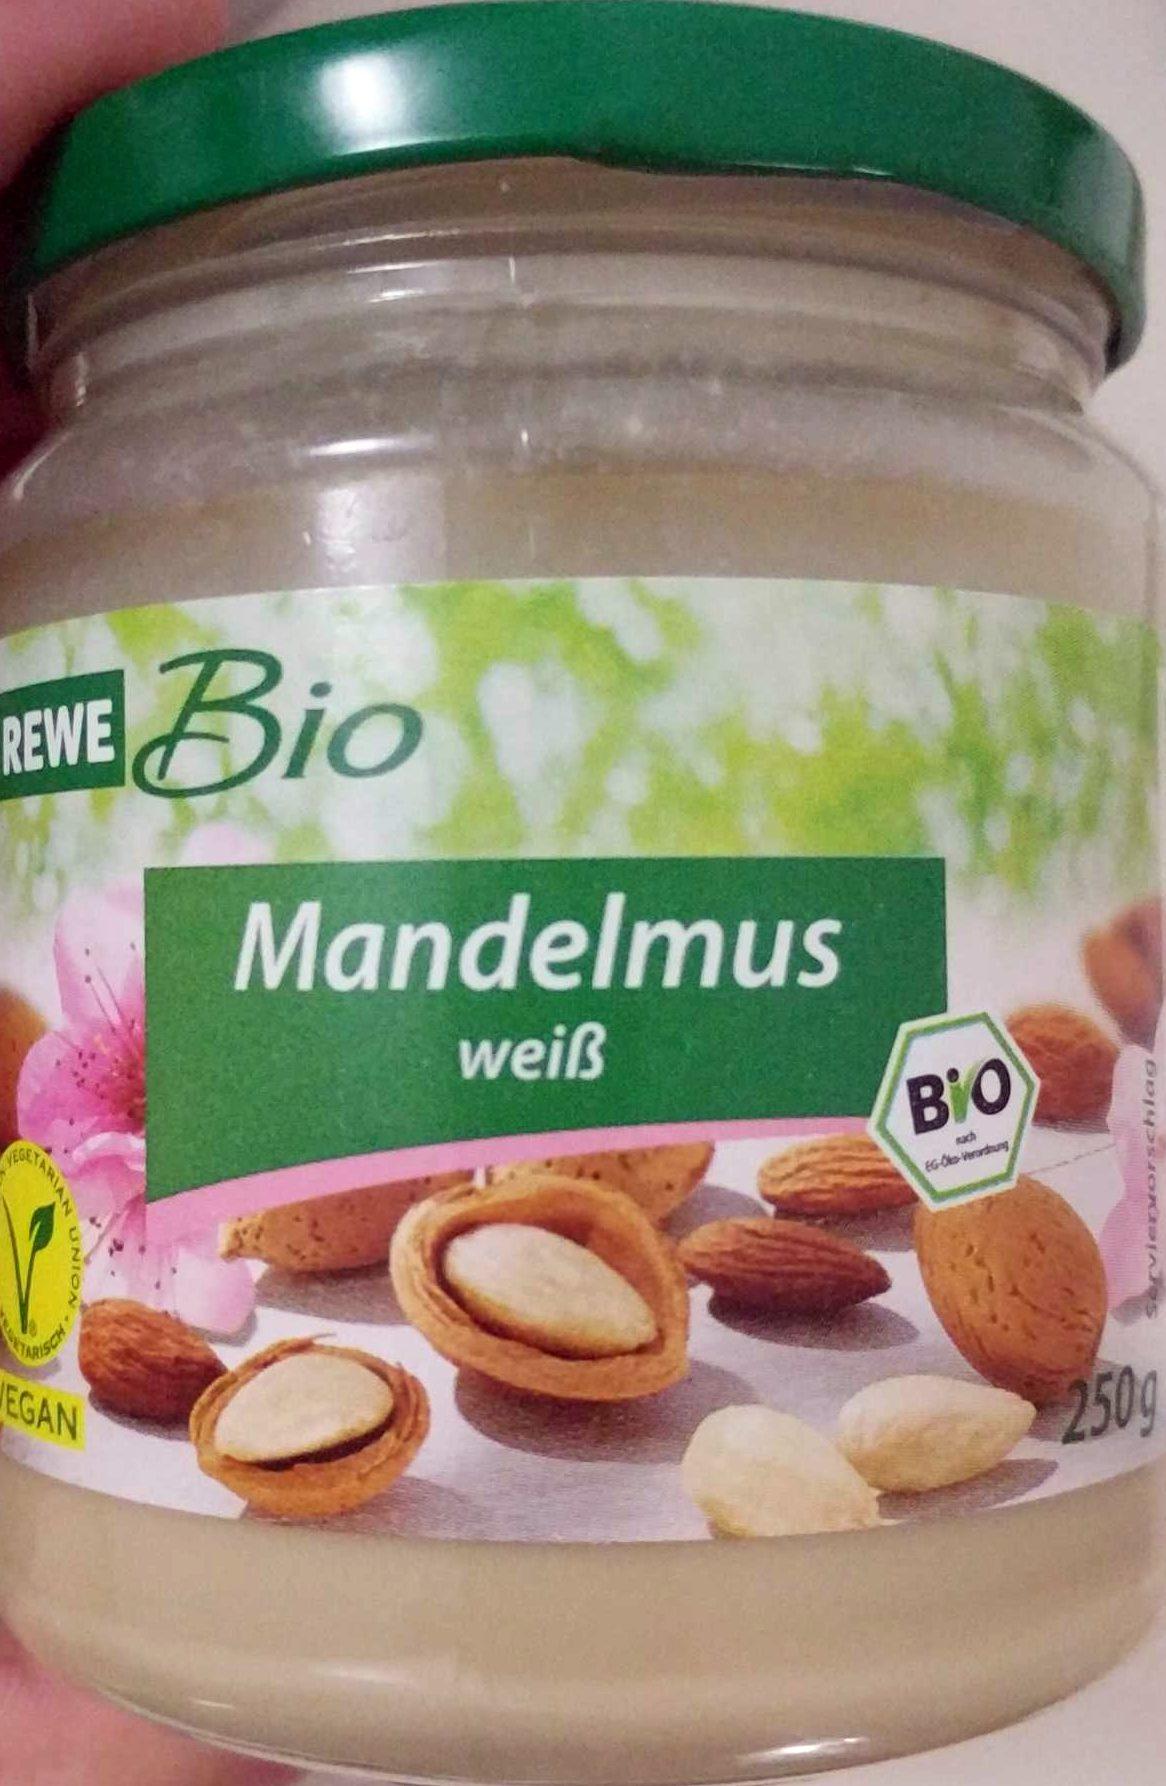 Mandelmus weiß - Product - en